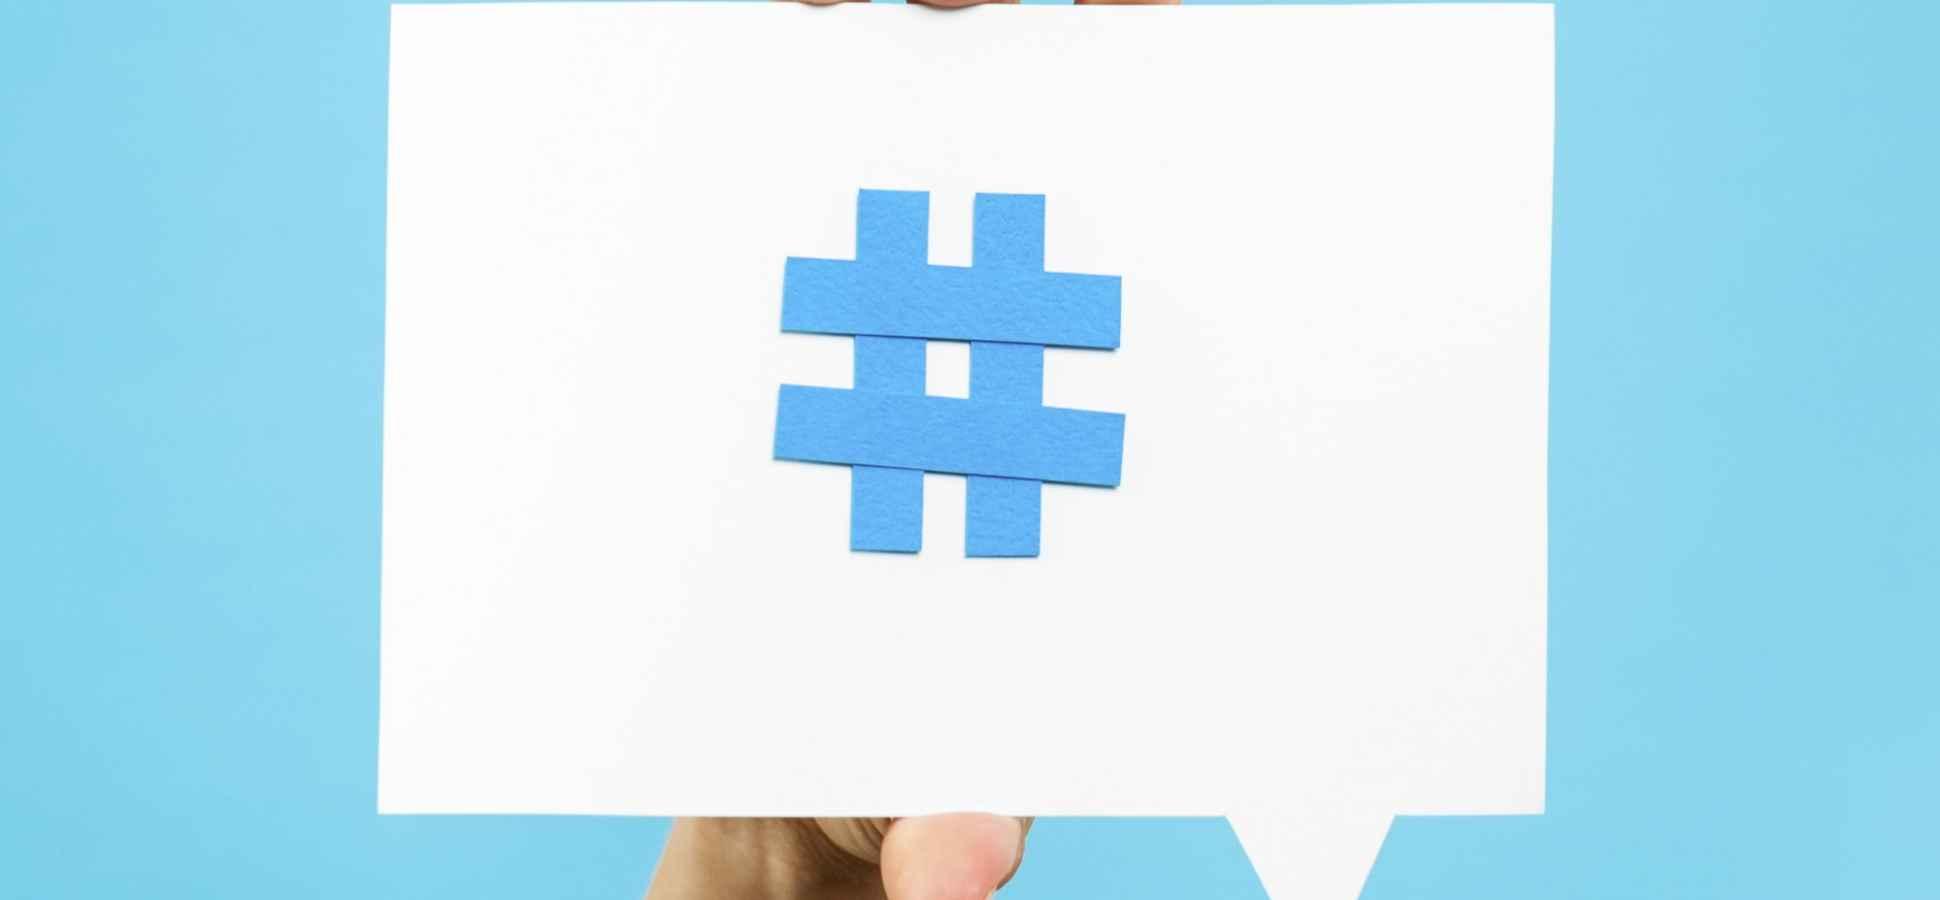 7 Twitter Marketing Mistakes You Should Never Make | Inc.com